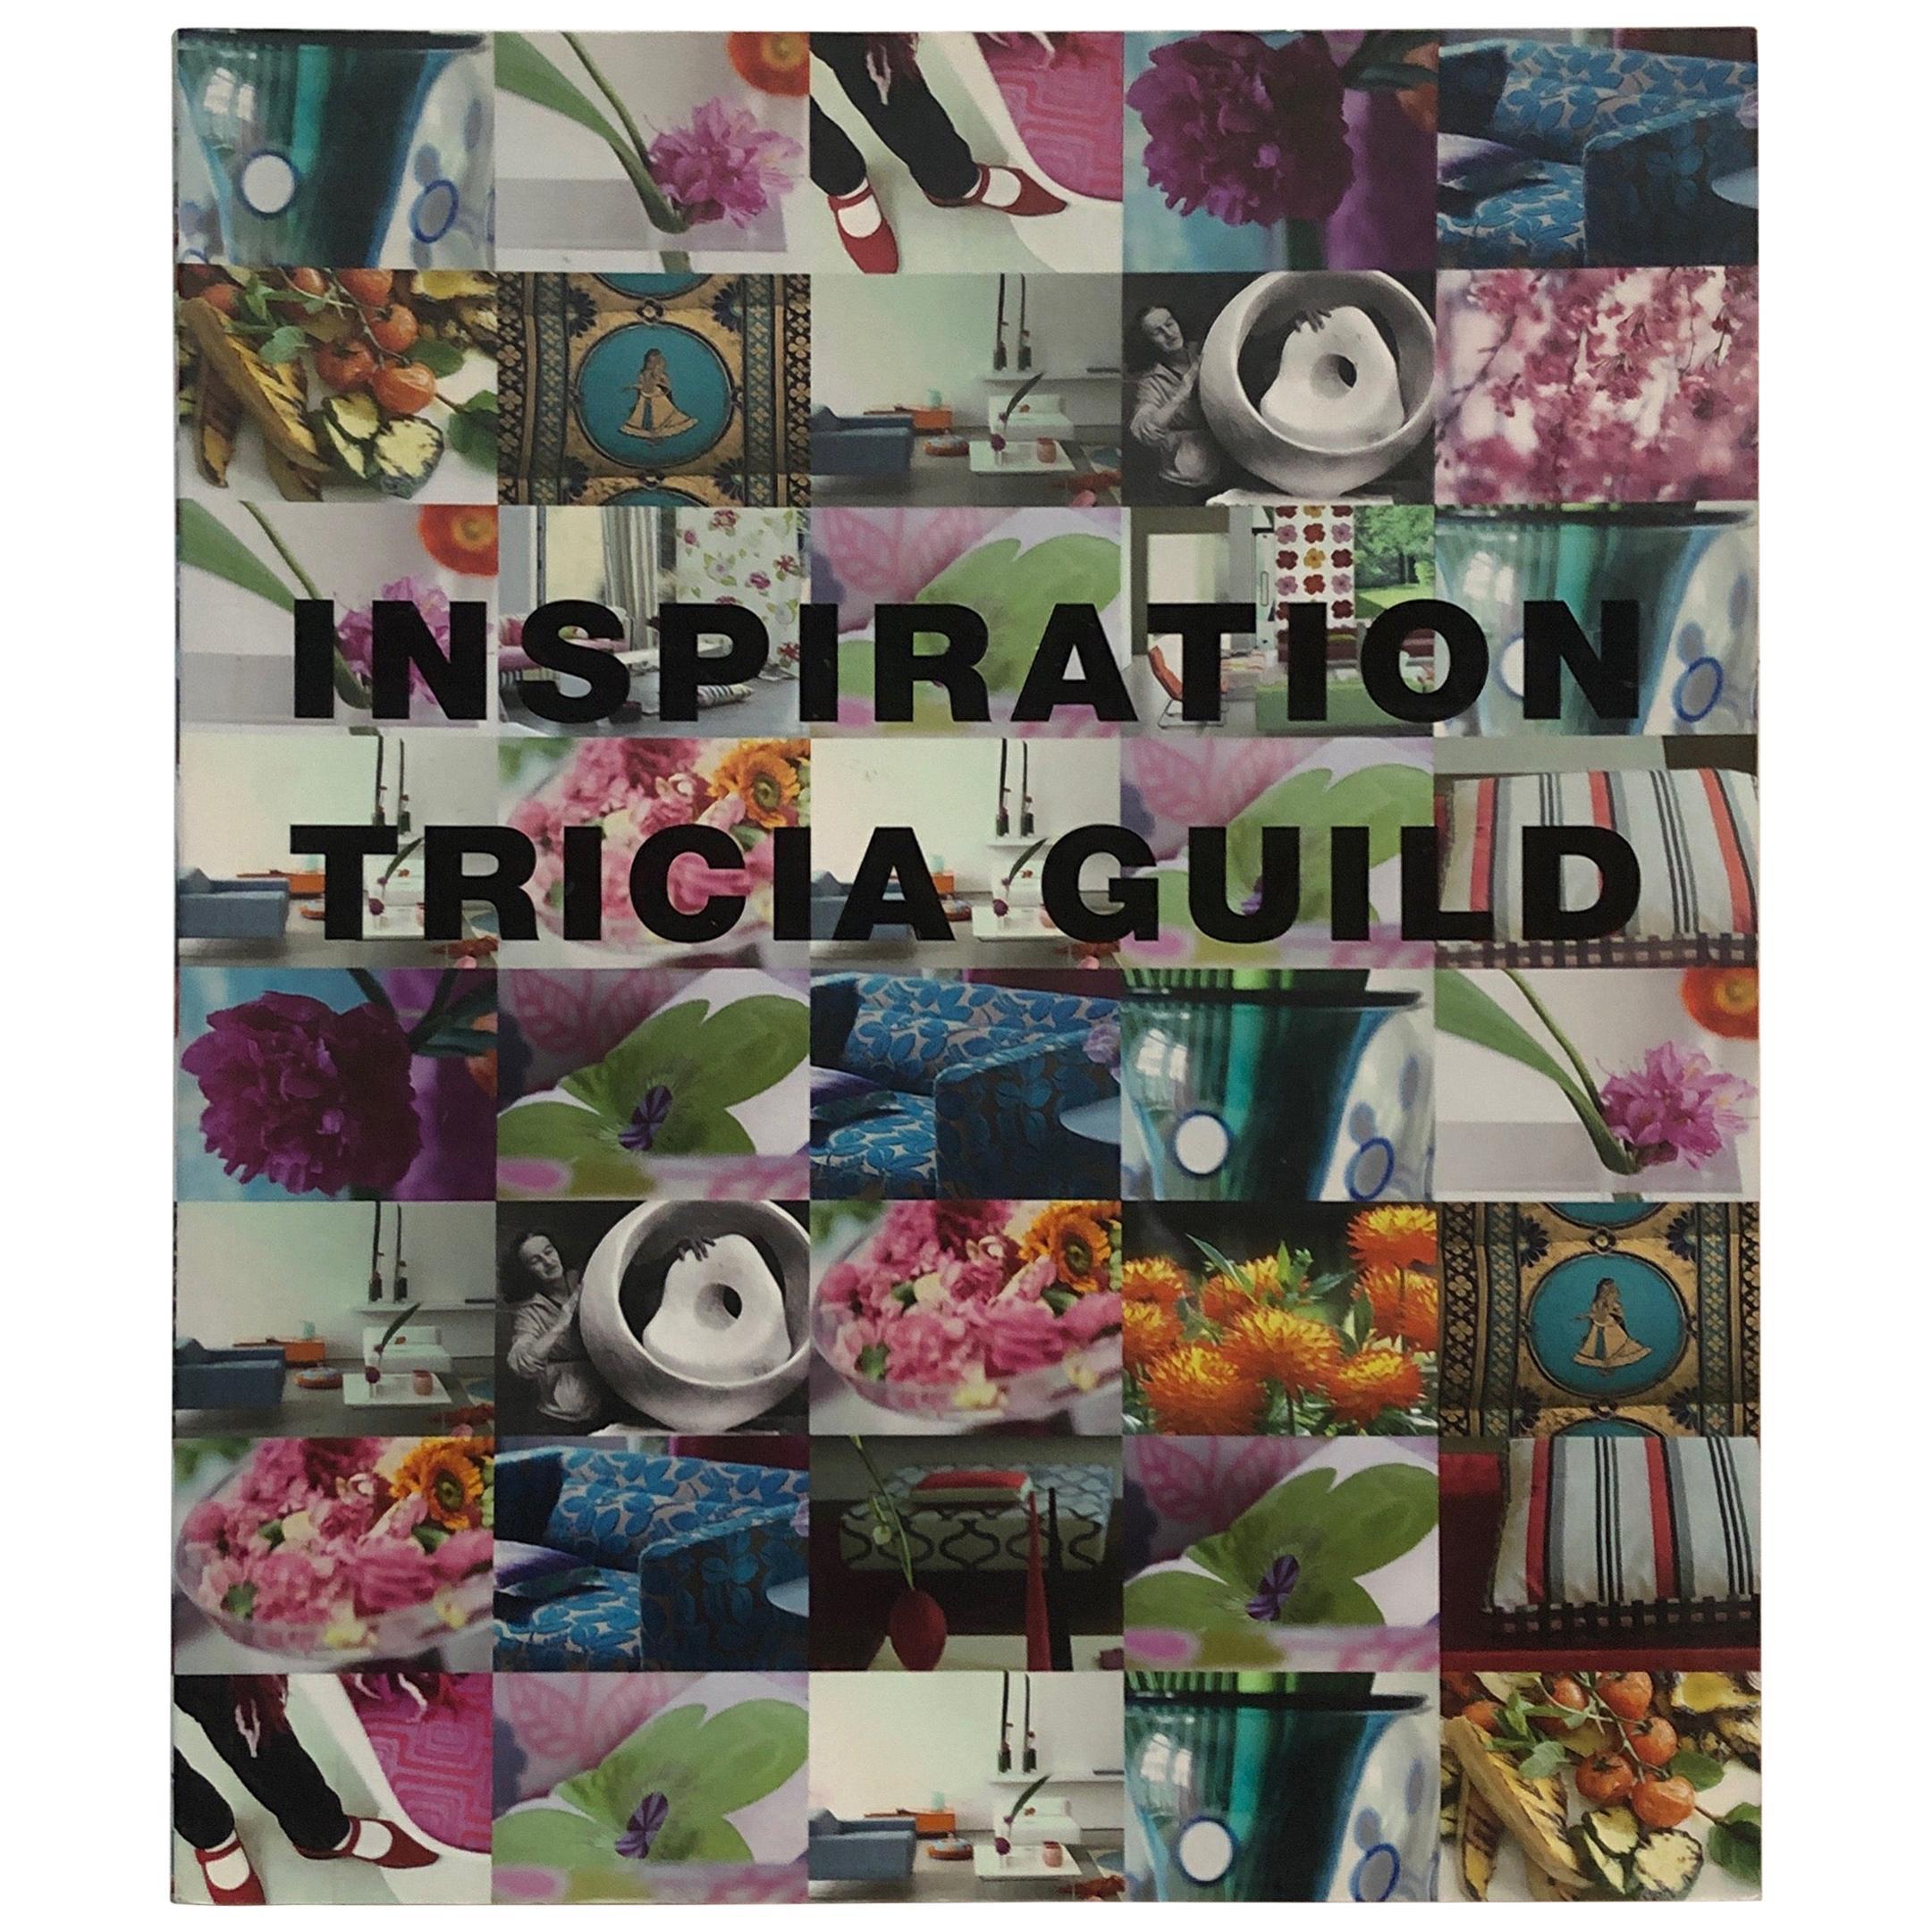 Inspiration Paperback Decorative Book